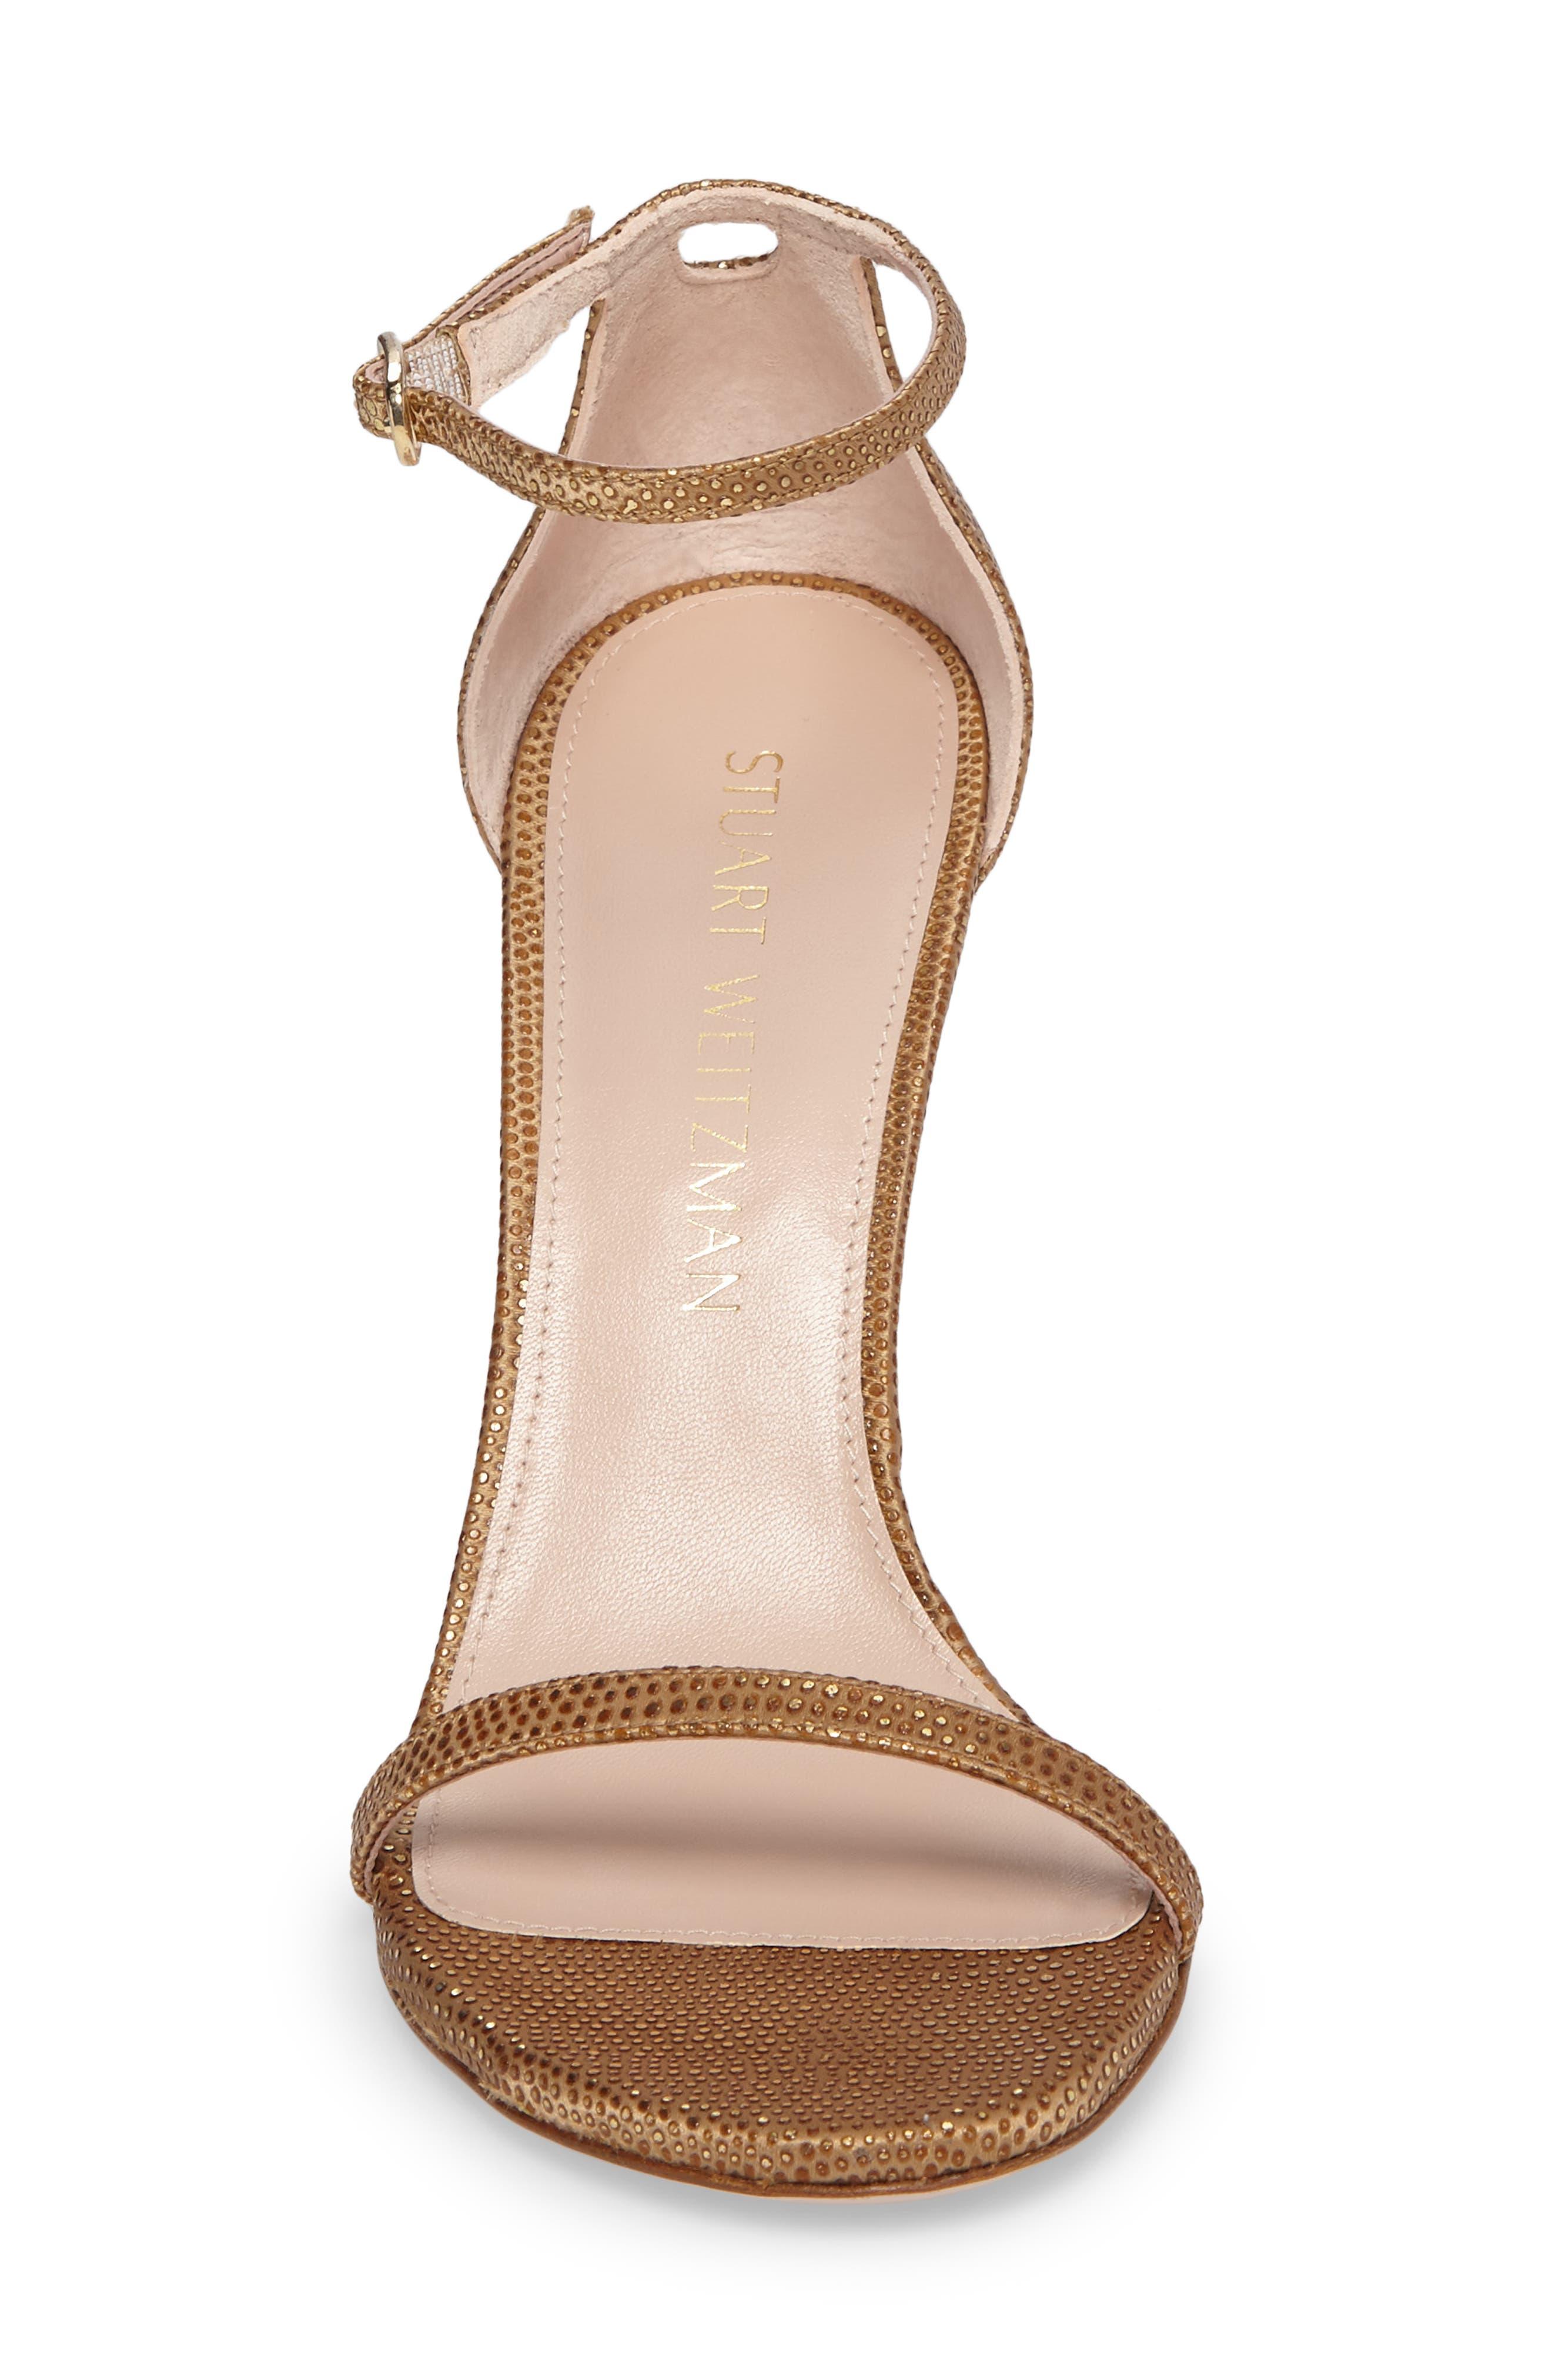 Nudistsong Ankle Strap Sandal,                             Alternate thumbnail 4, color,                             Gold Dot